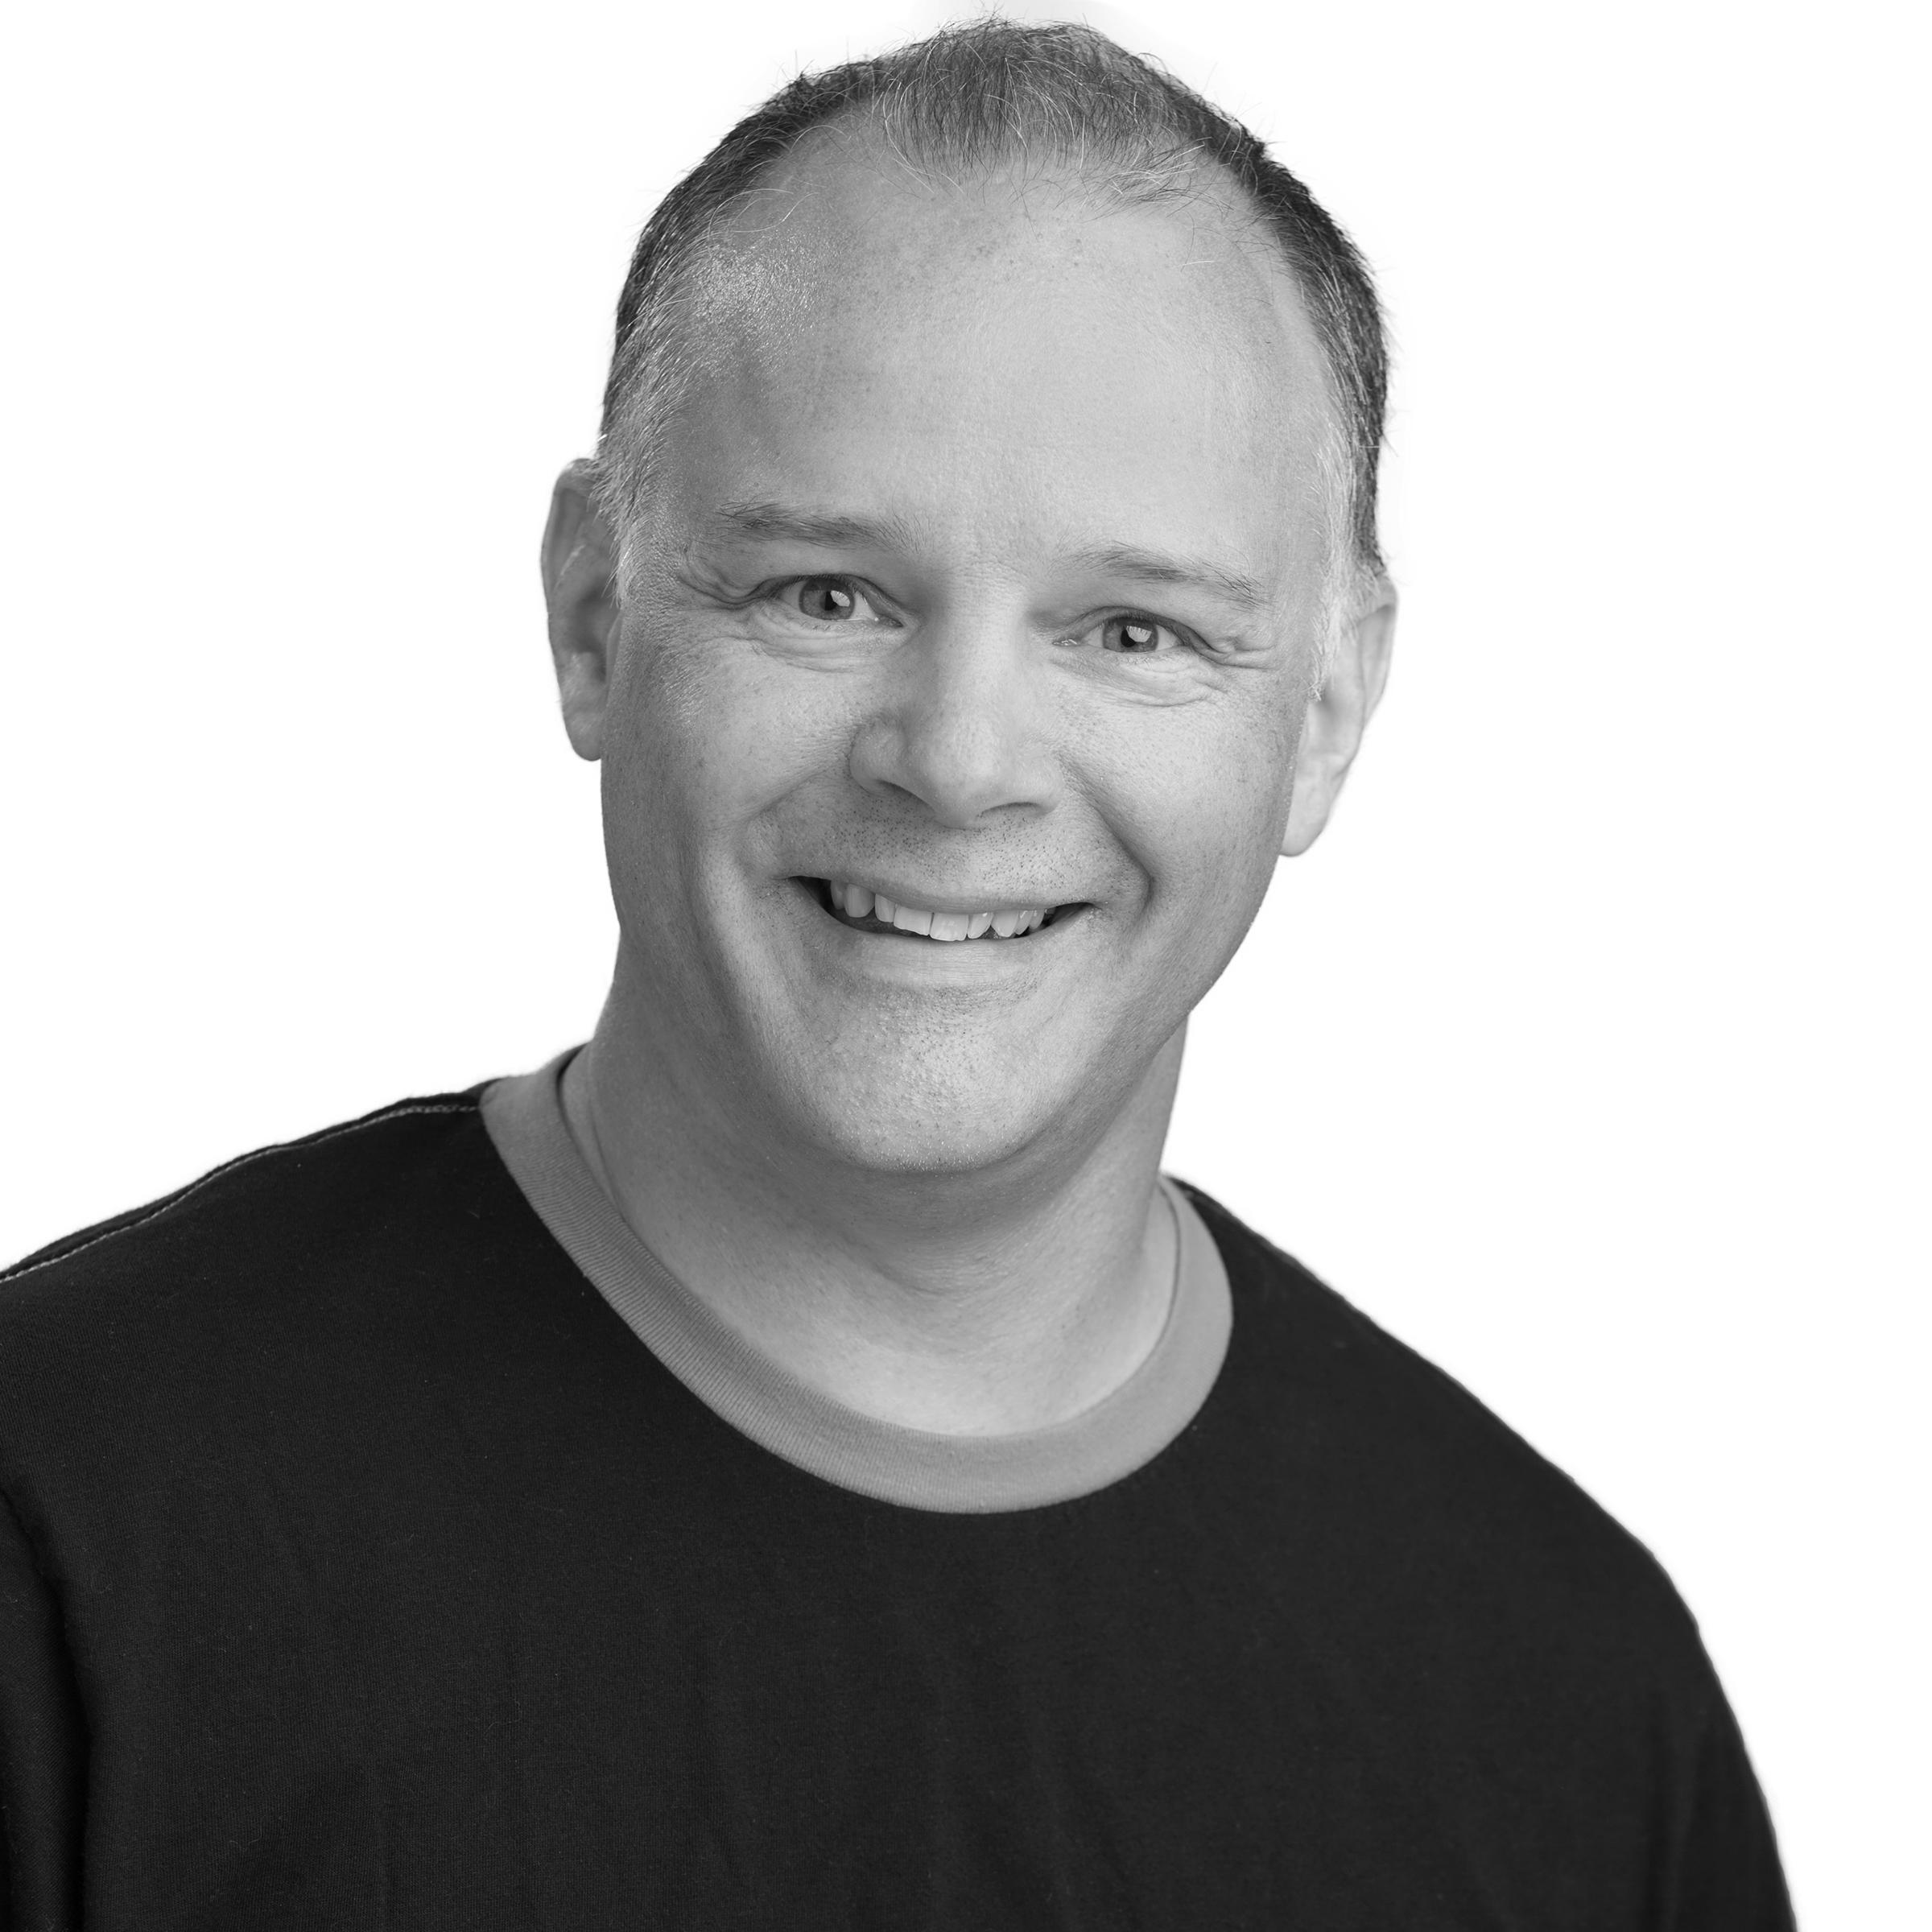 Brian Brinkman, The Buzz Maker, Public Relations, PR, On the Brink Creative, Designer, Graphic Designer.